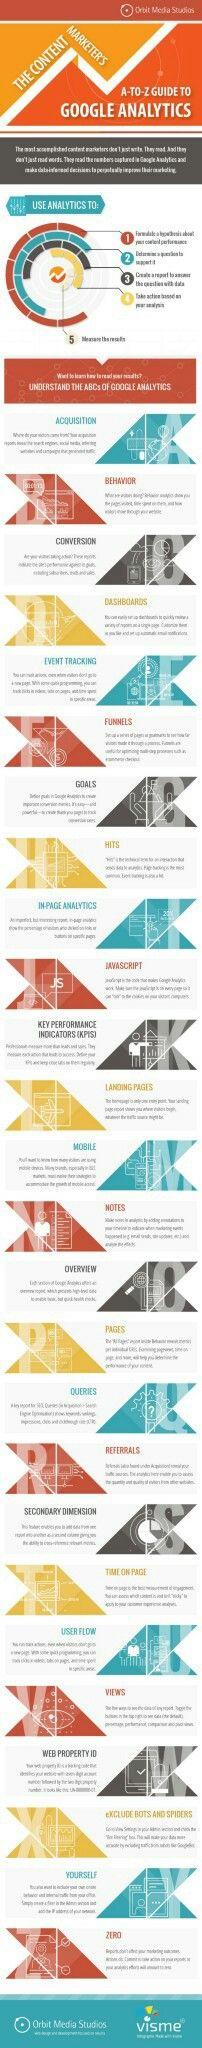 Google Analytics for Content Marketeers